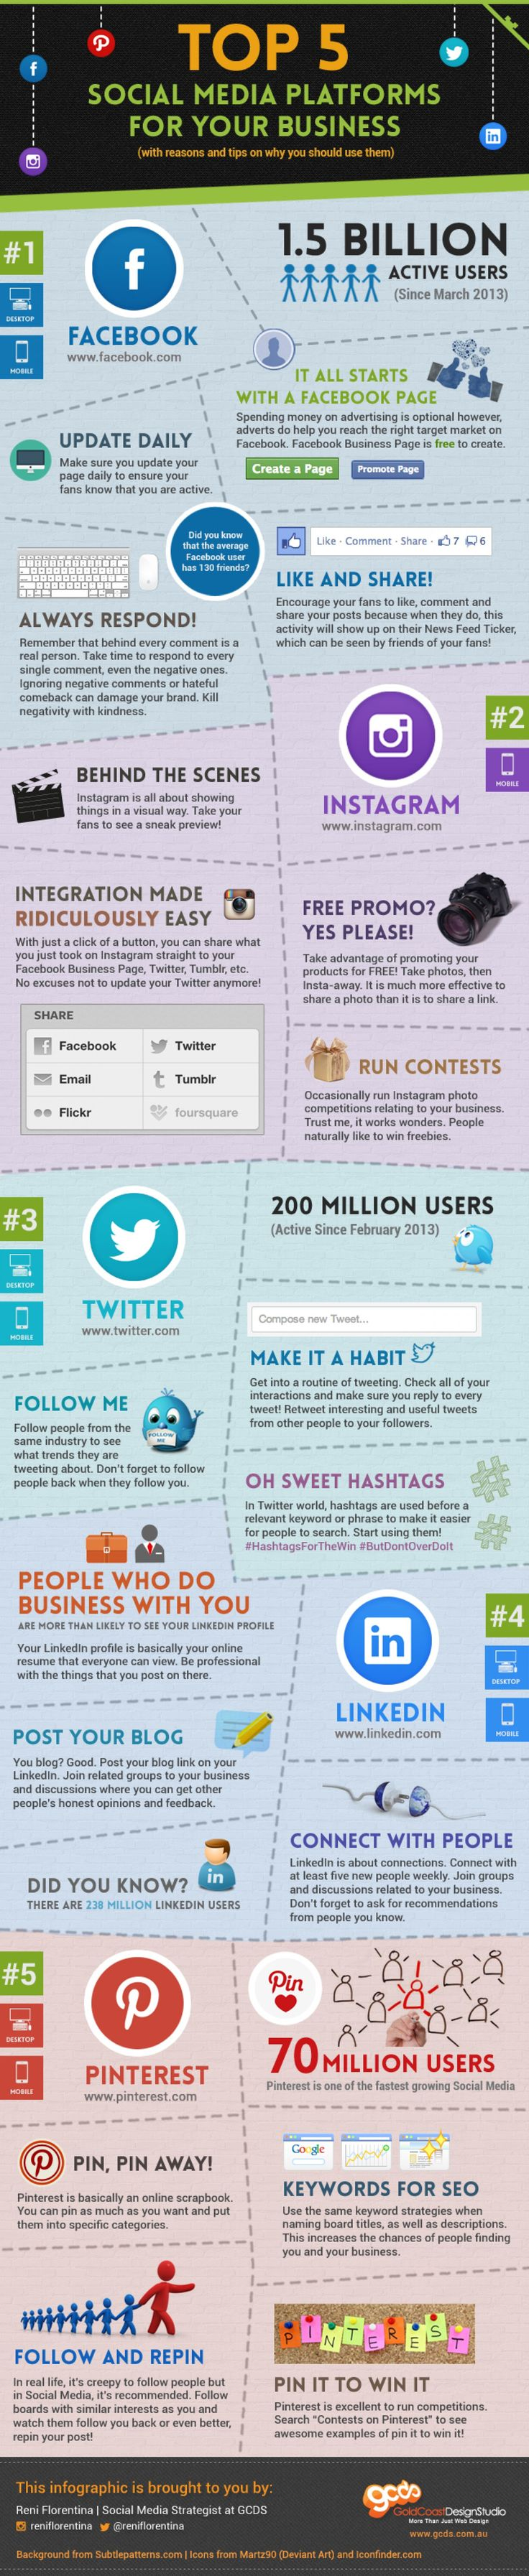 Top 5 #SocialMedia Platforms Your #Business Should Use